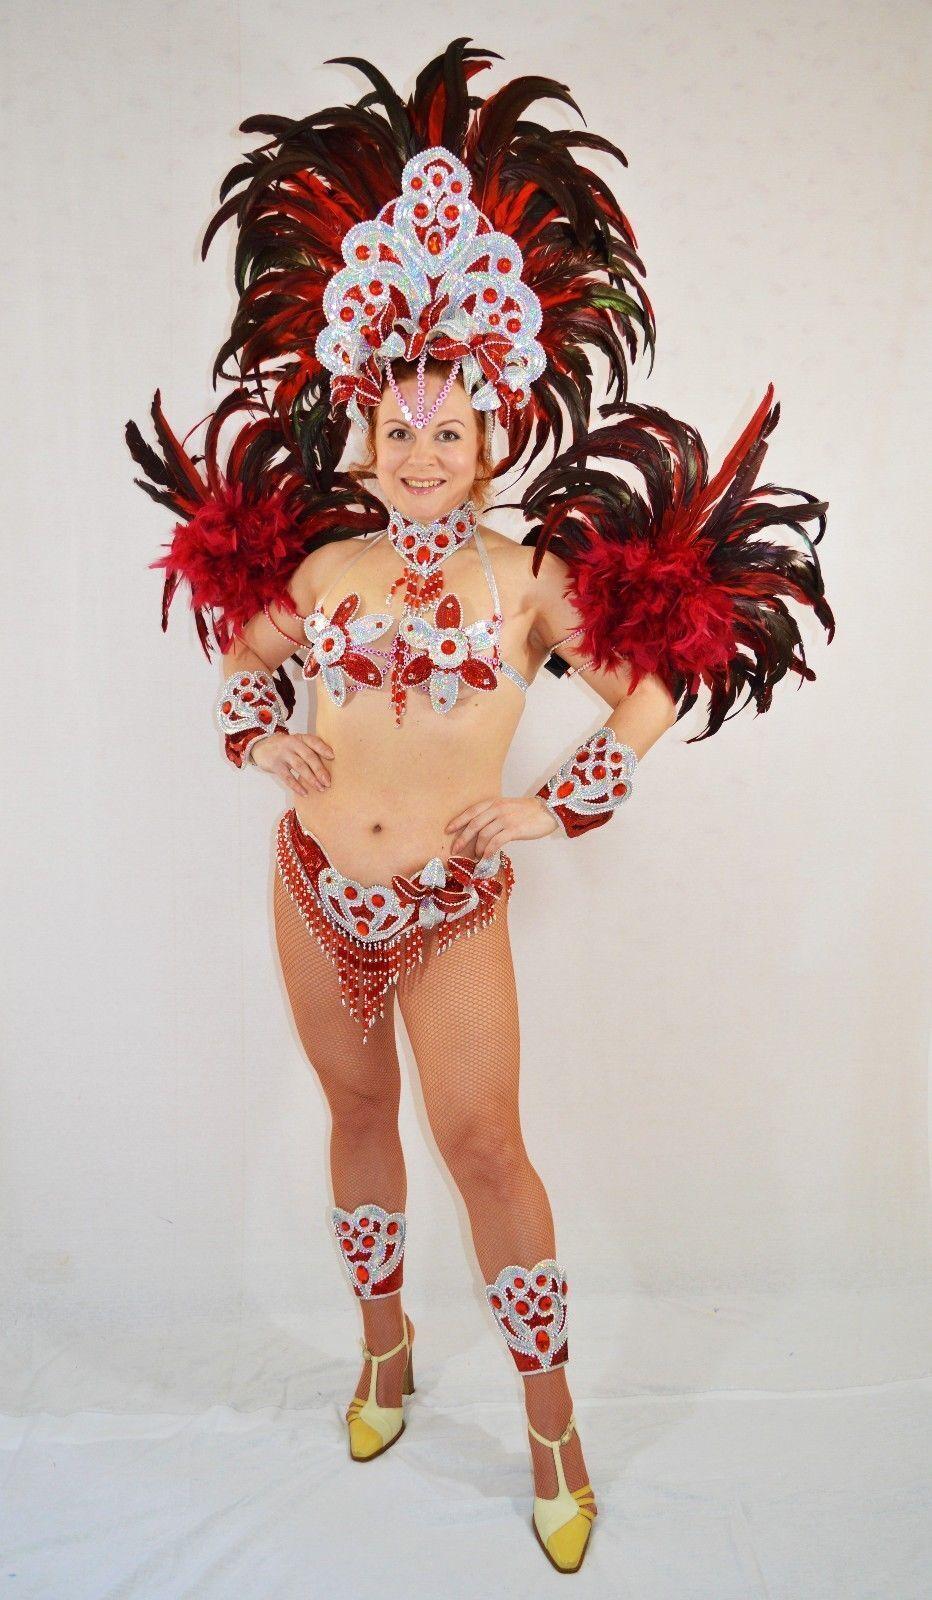 BRAZILIAN RED/SILVER SHOW GIRL SAMBA CABARET COSTUME bikini/CUSTOM MADE